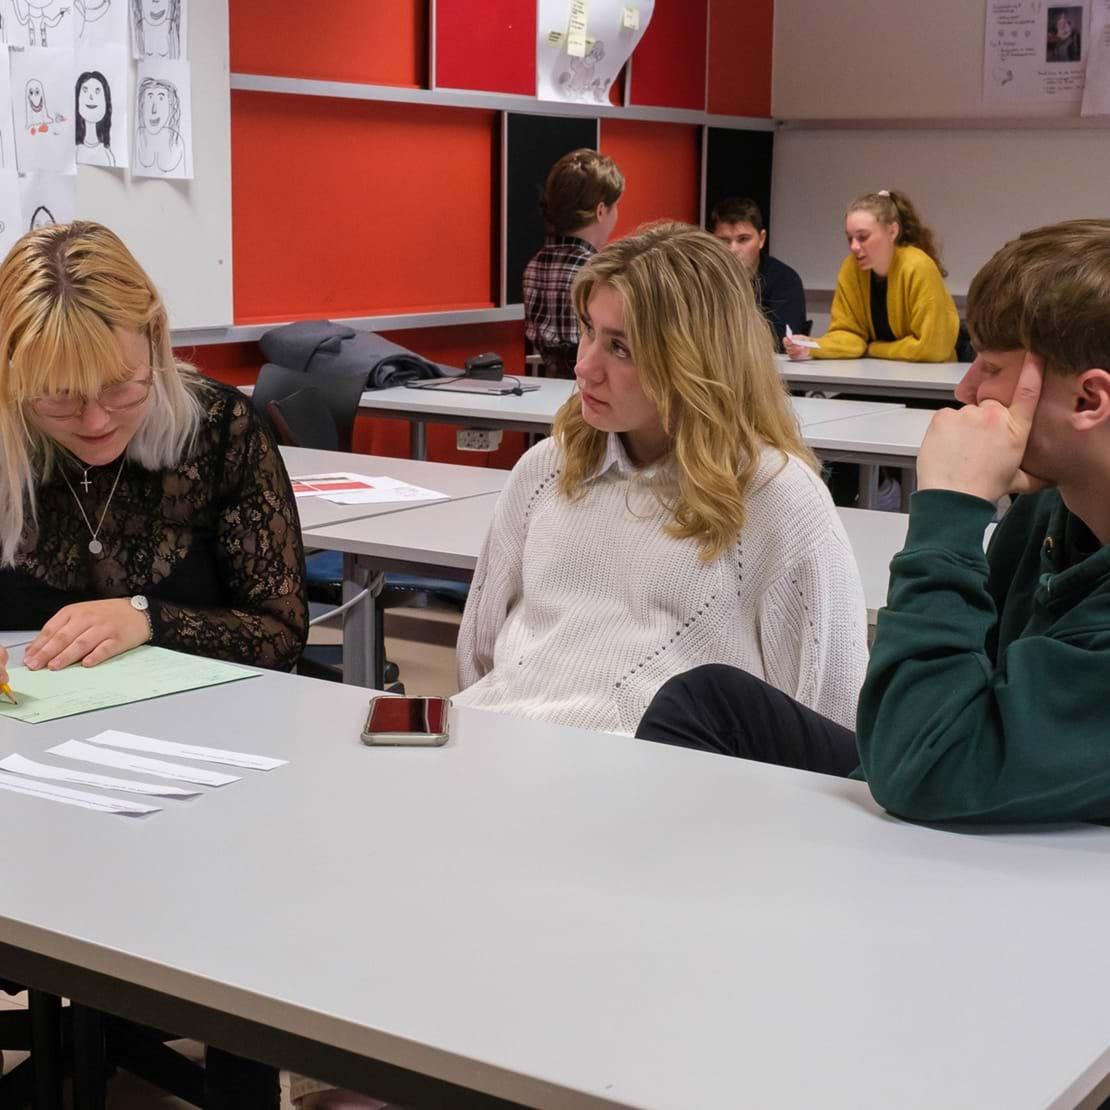 Tre elever laver gruppearbejde